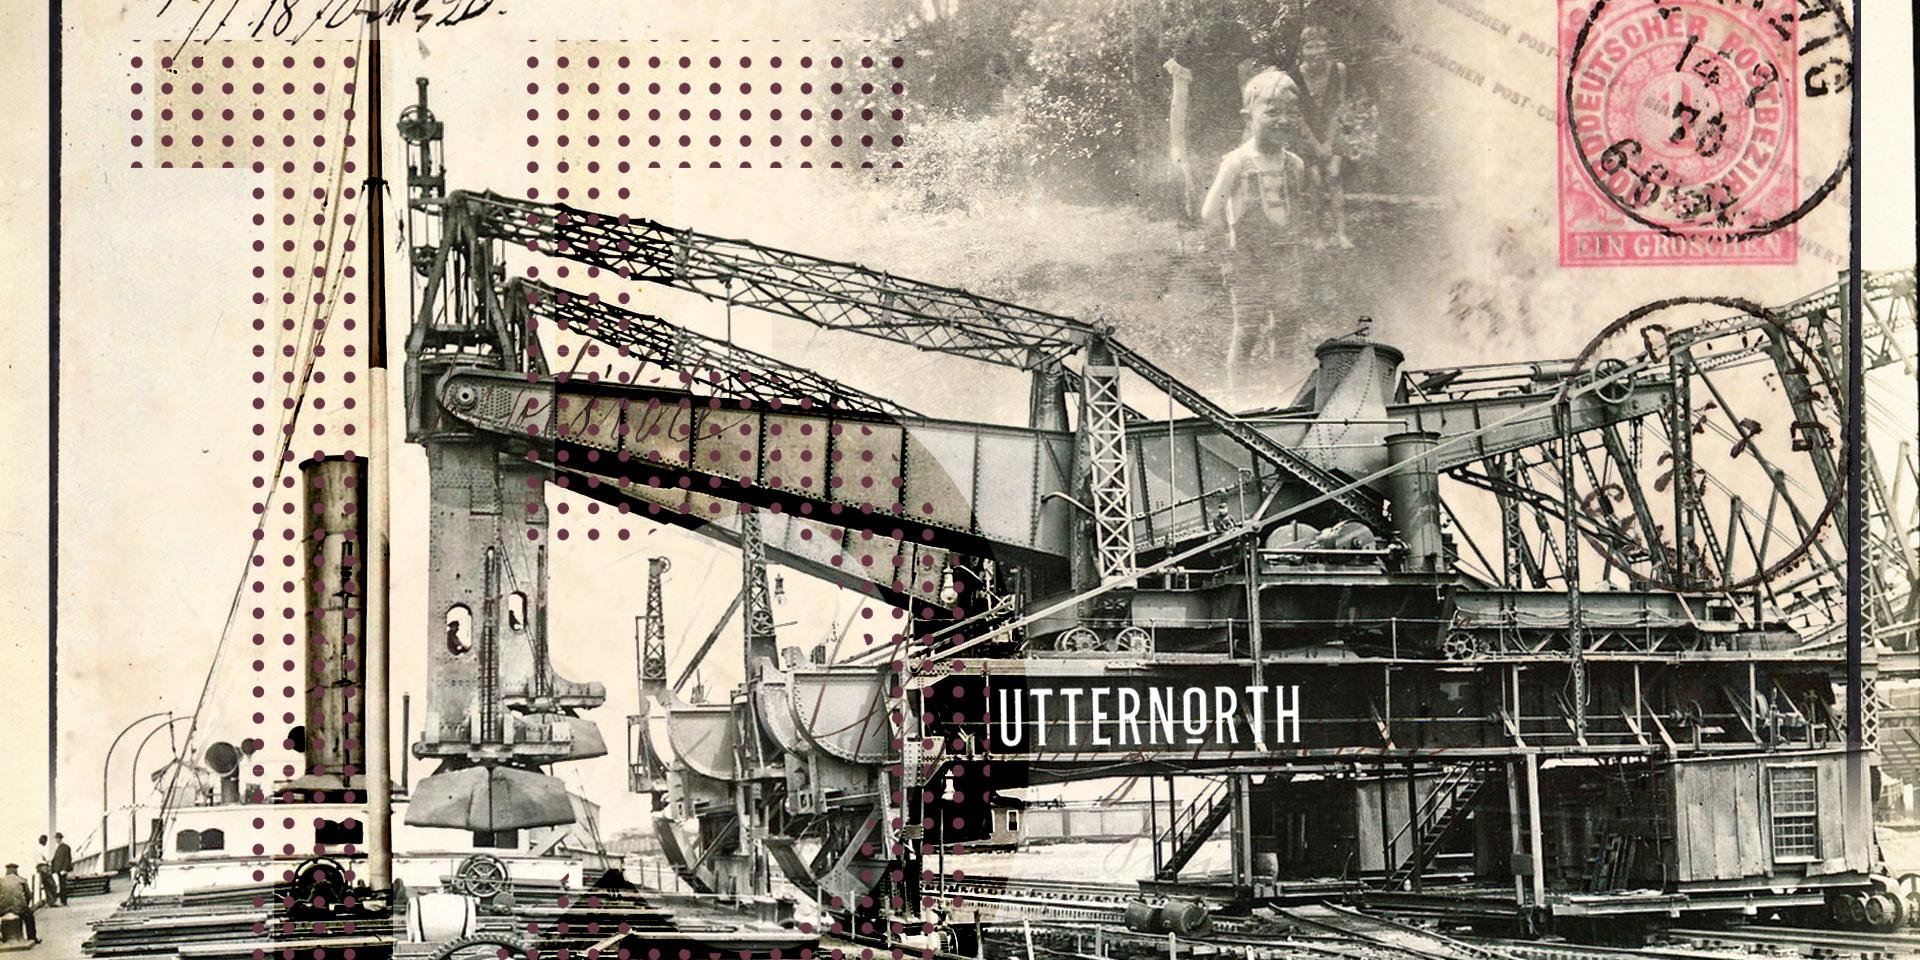 grue vintage industriel